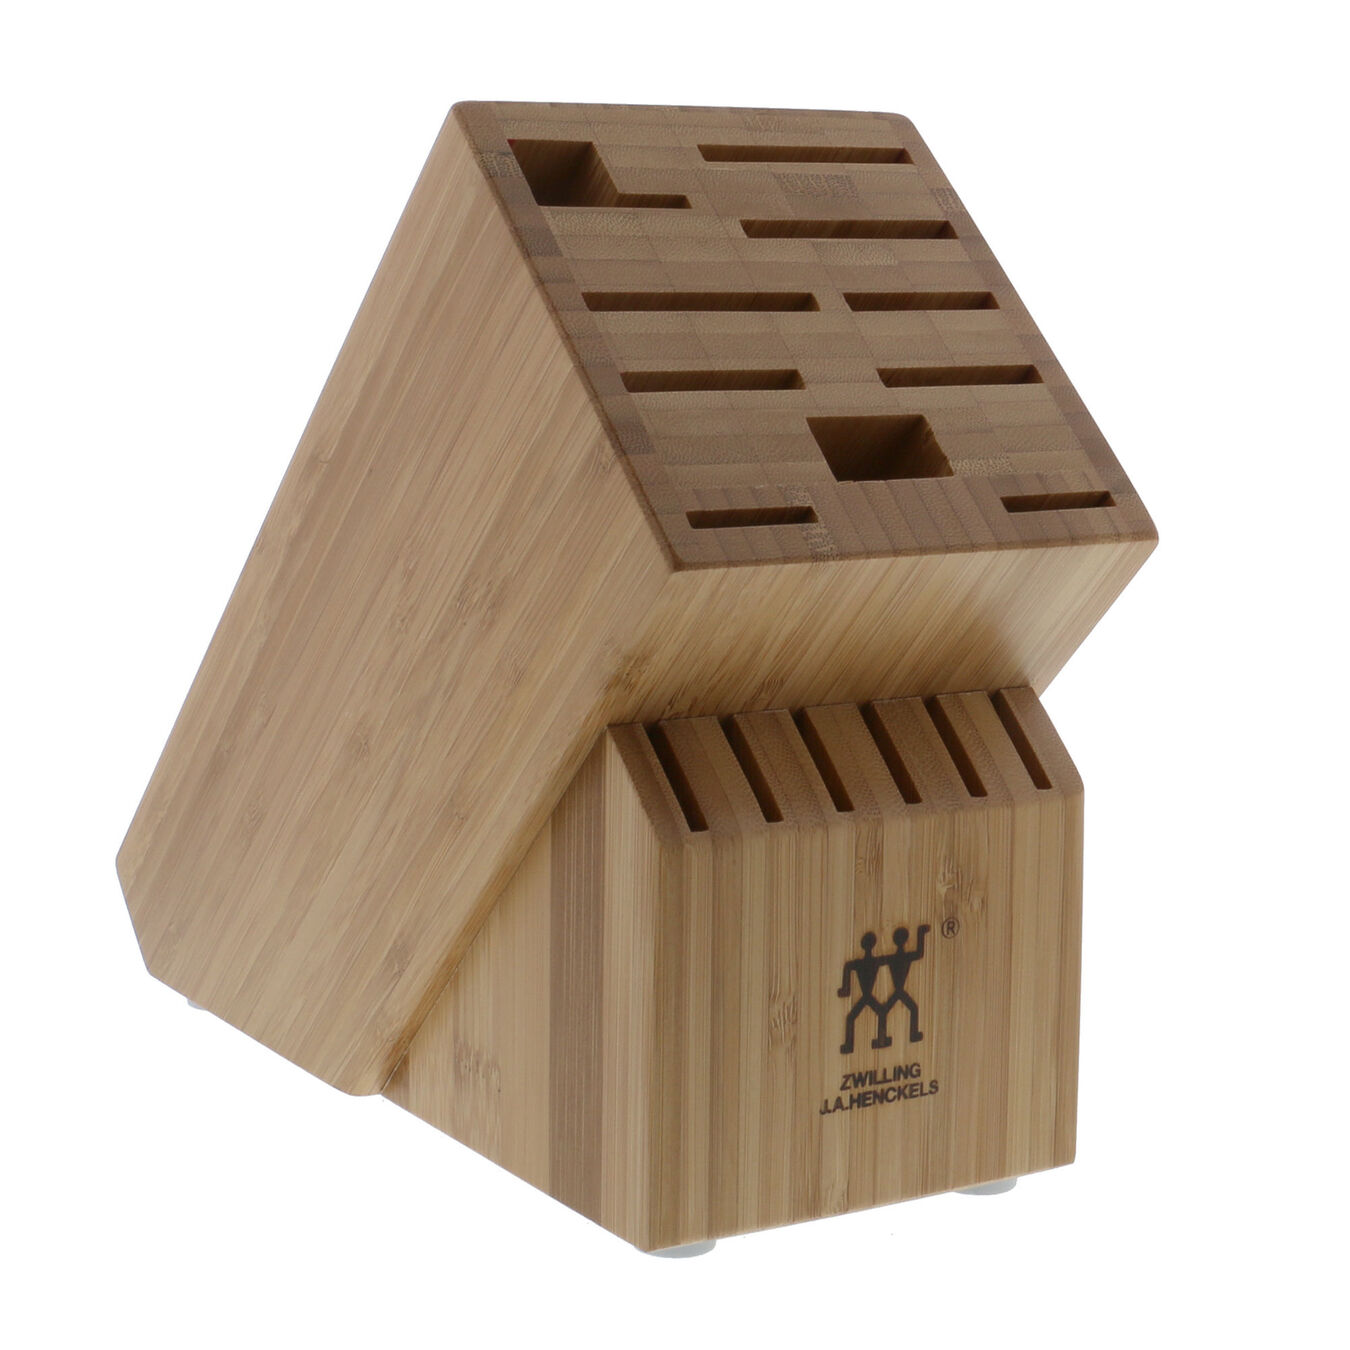 bamboo, TWIN Knife block empty,,large 1